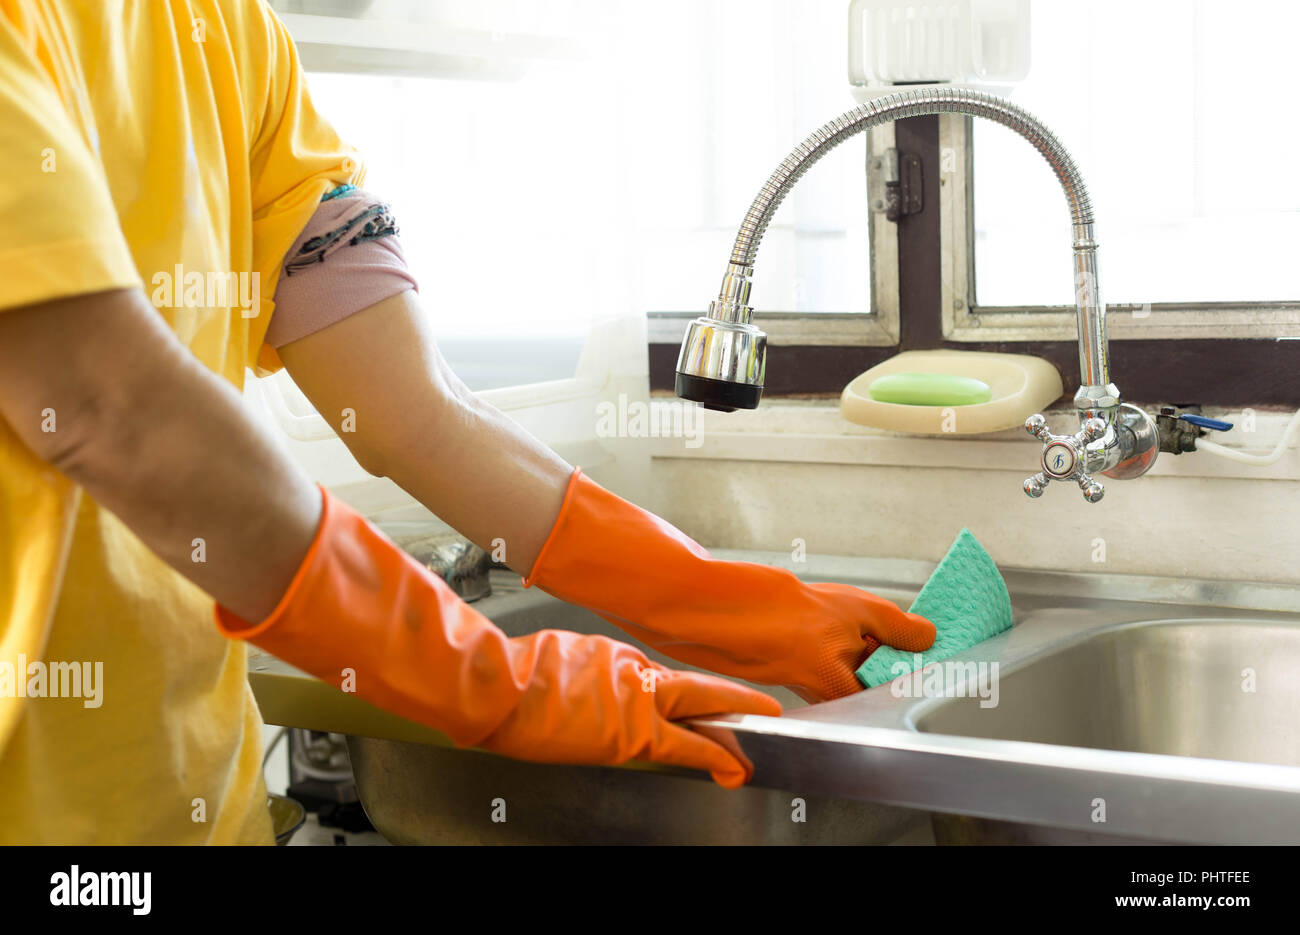 Hand With Orange Glove Cleaning Kitchen Sink Stock Photo Alamy